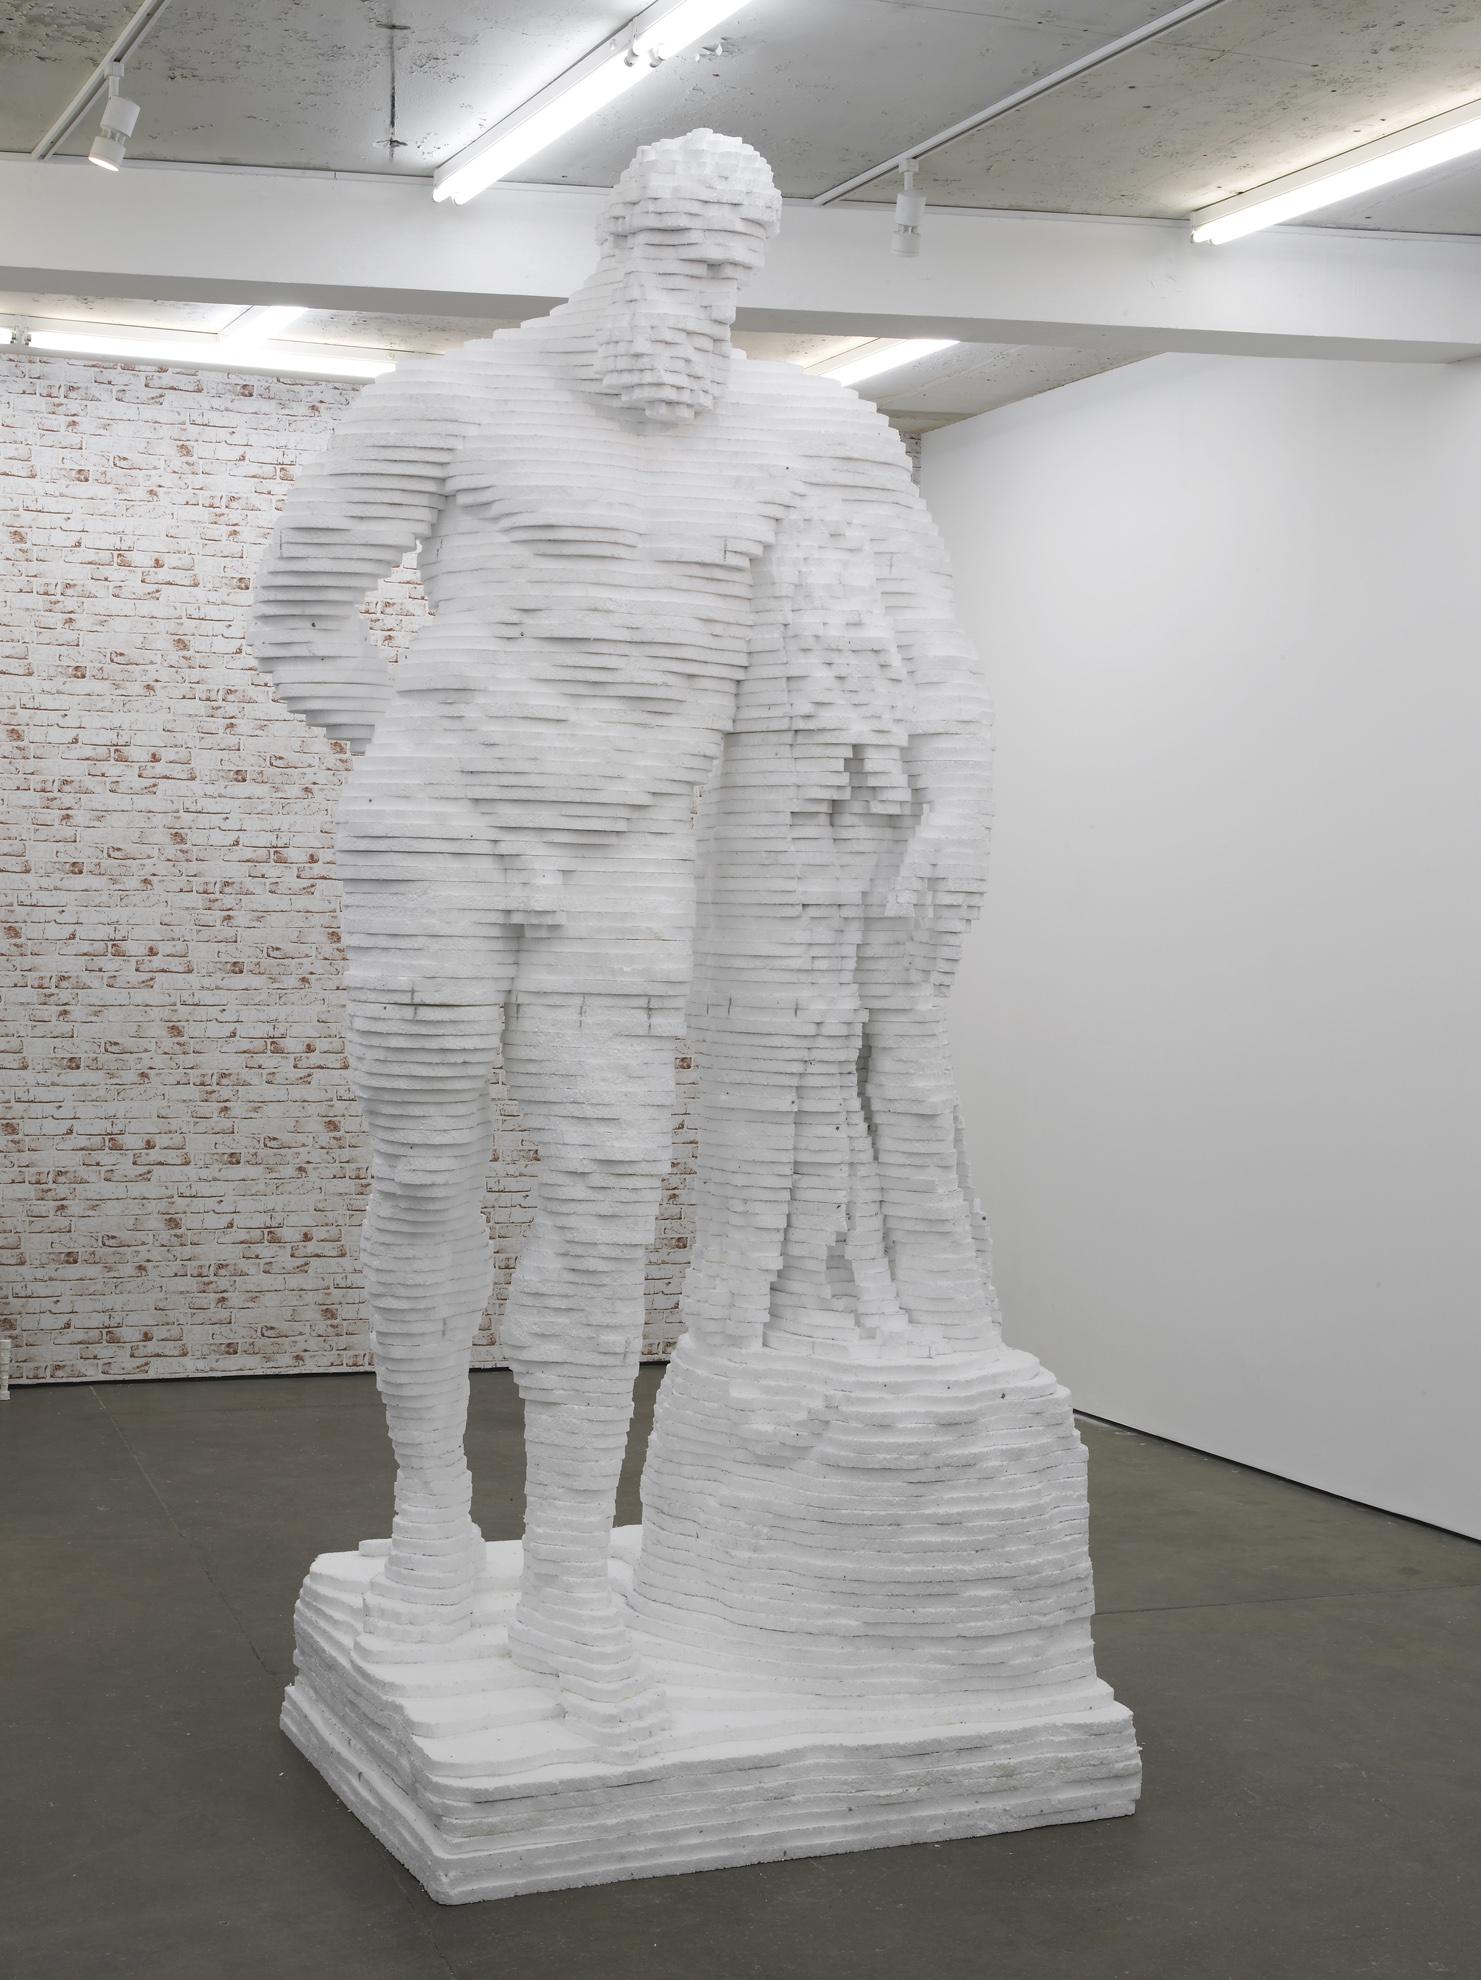 Hercules  2014  Polystyrene  315 x 130 x 106 cm / 124 x 51.1 x 41.7 in